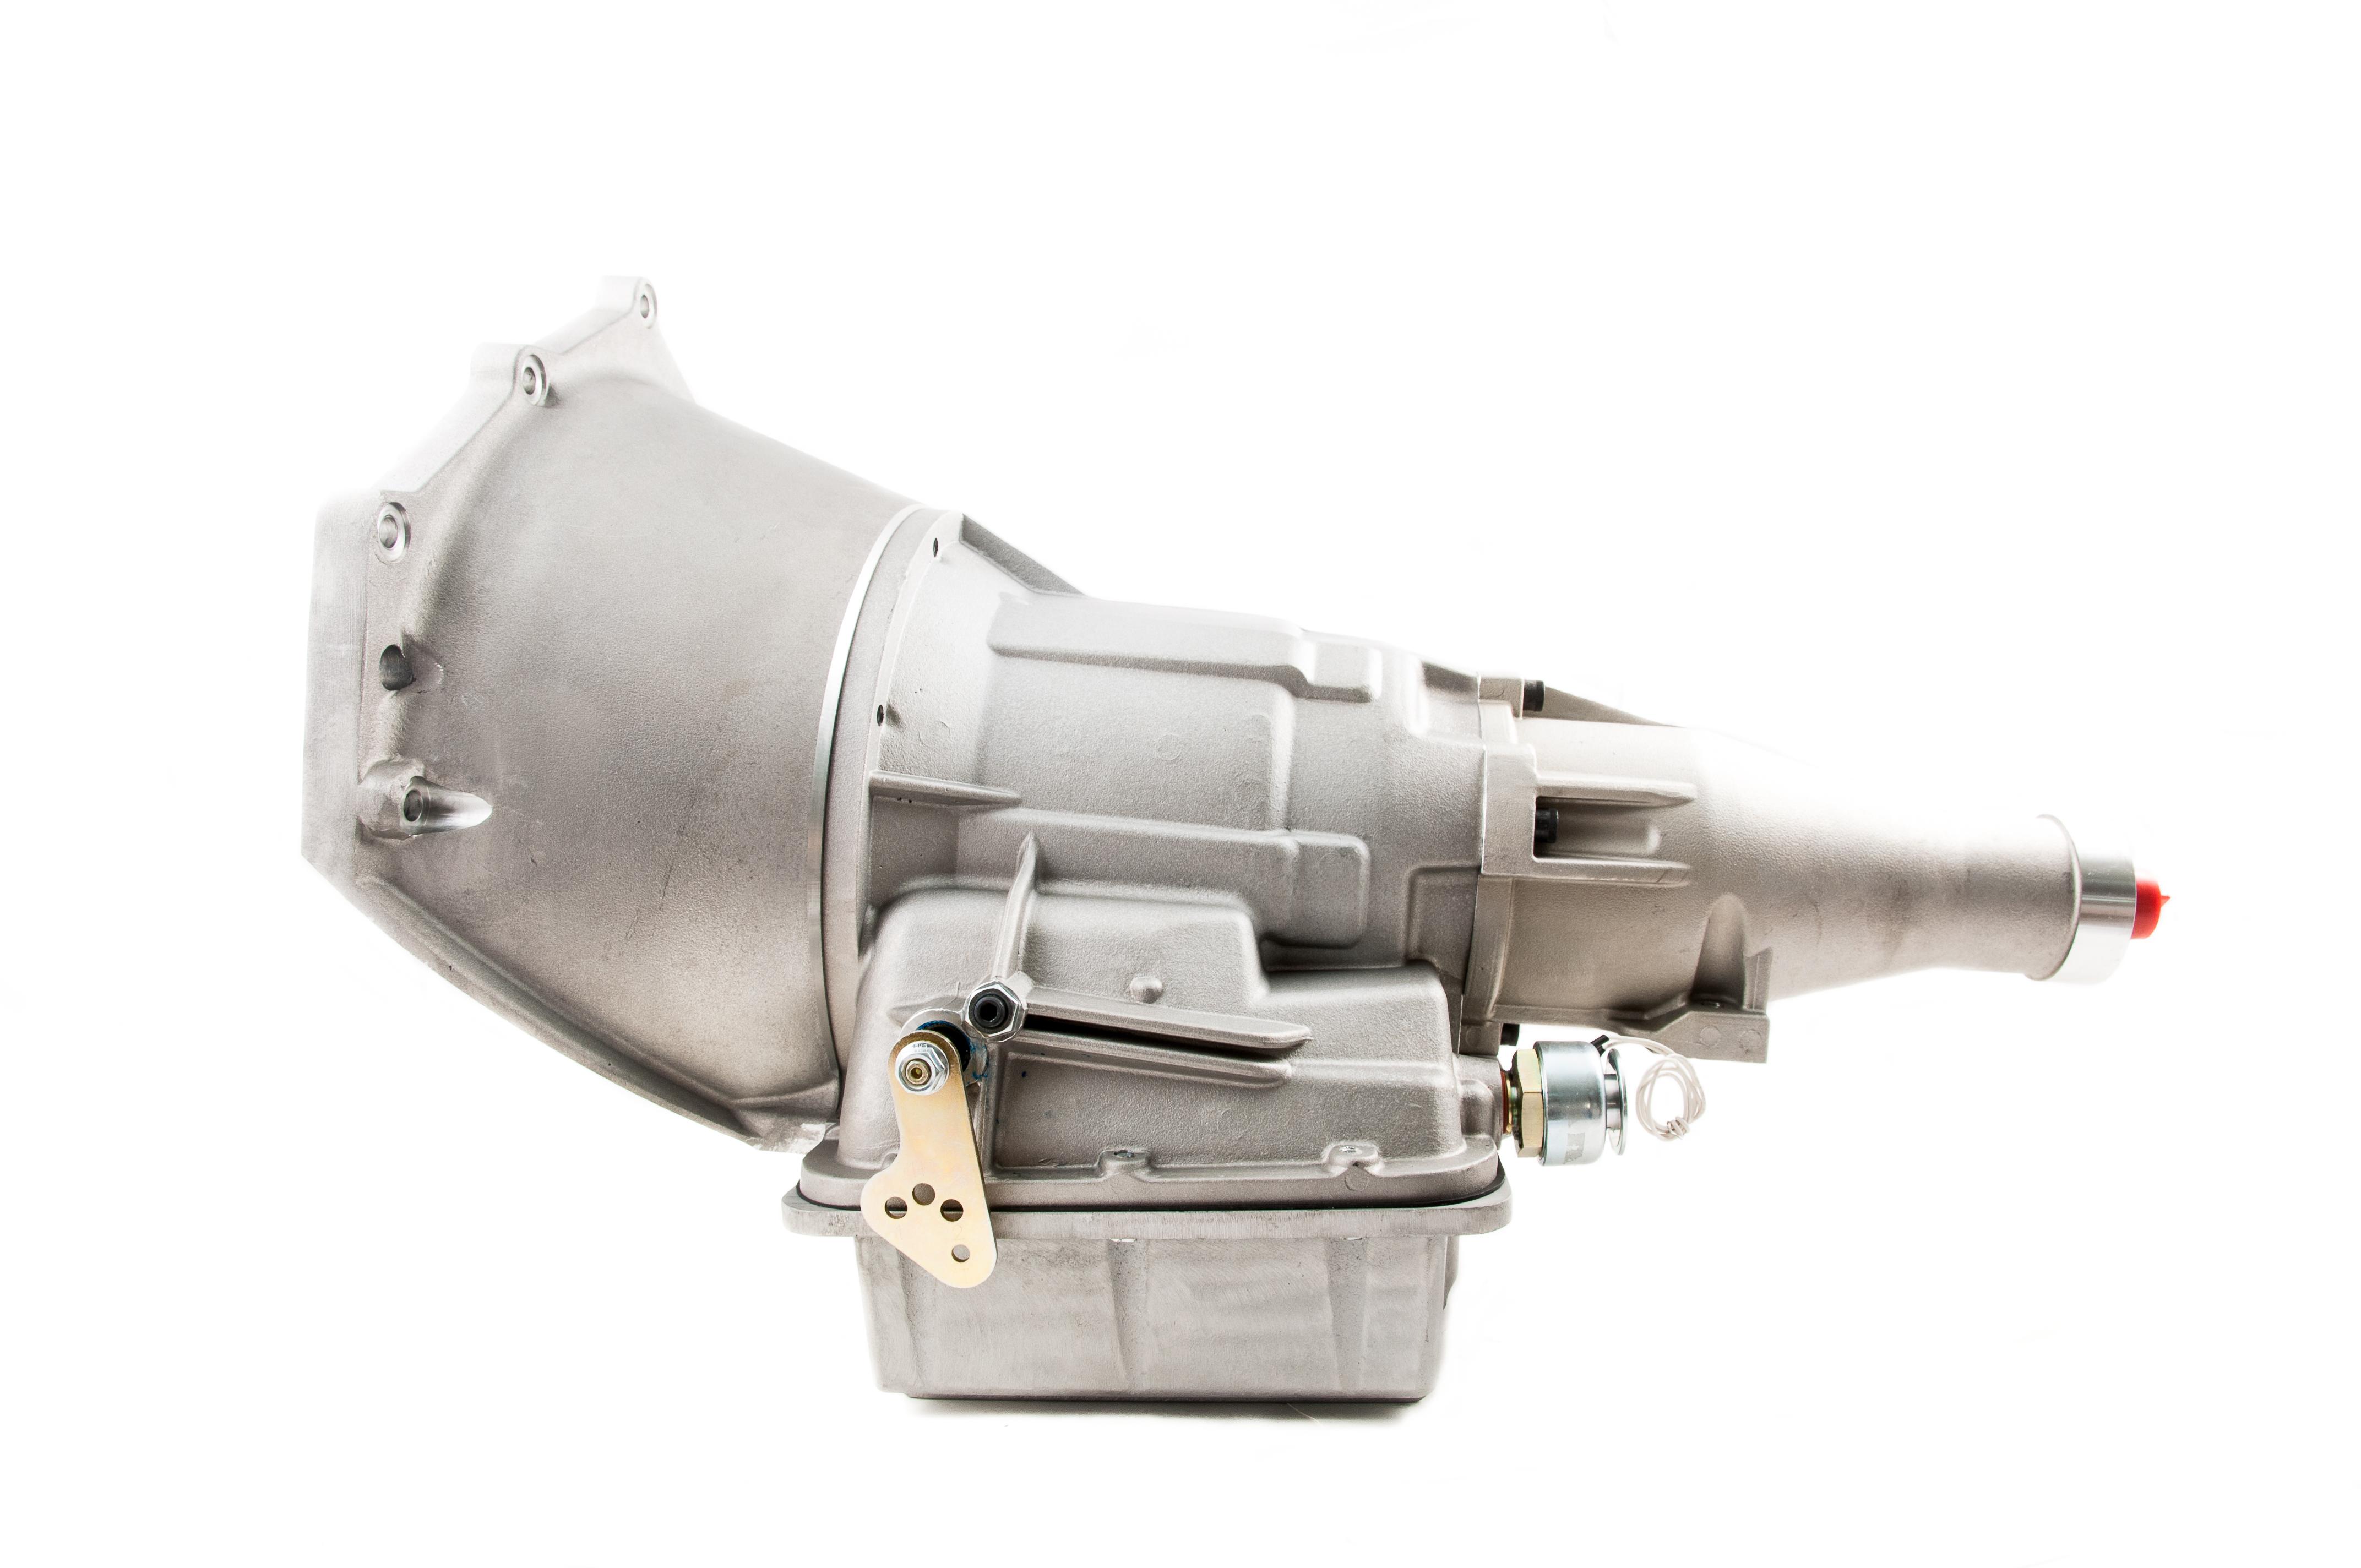 racing parts bte top sportsman powerglide 700r4 transmission valve body  diagrams bte top sportsman powerglide